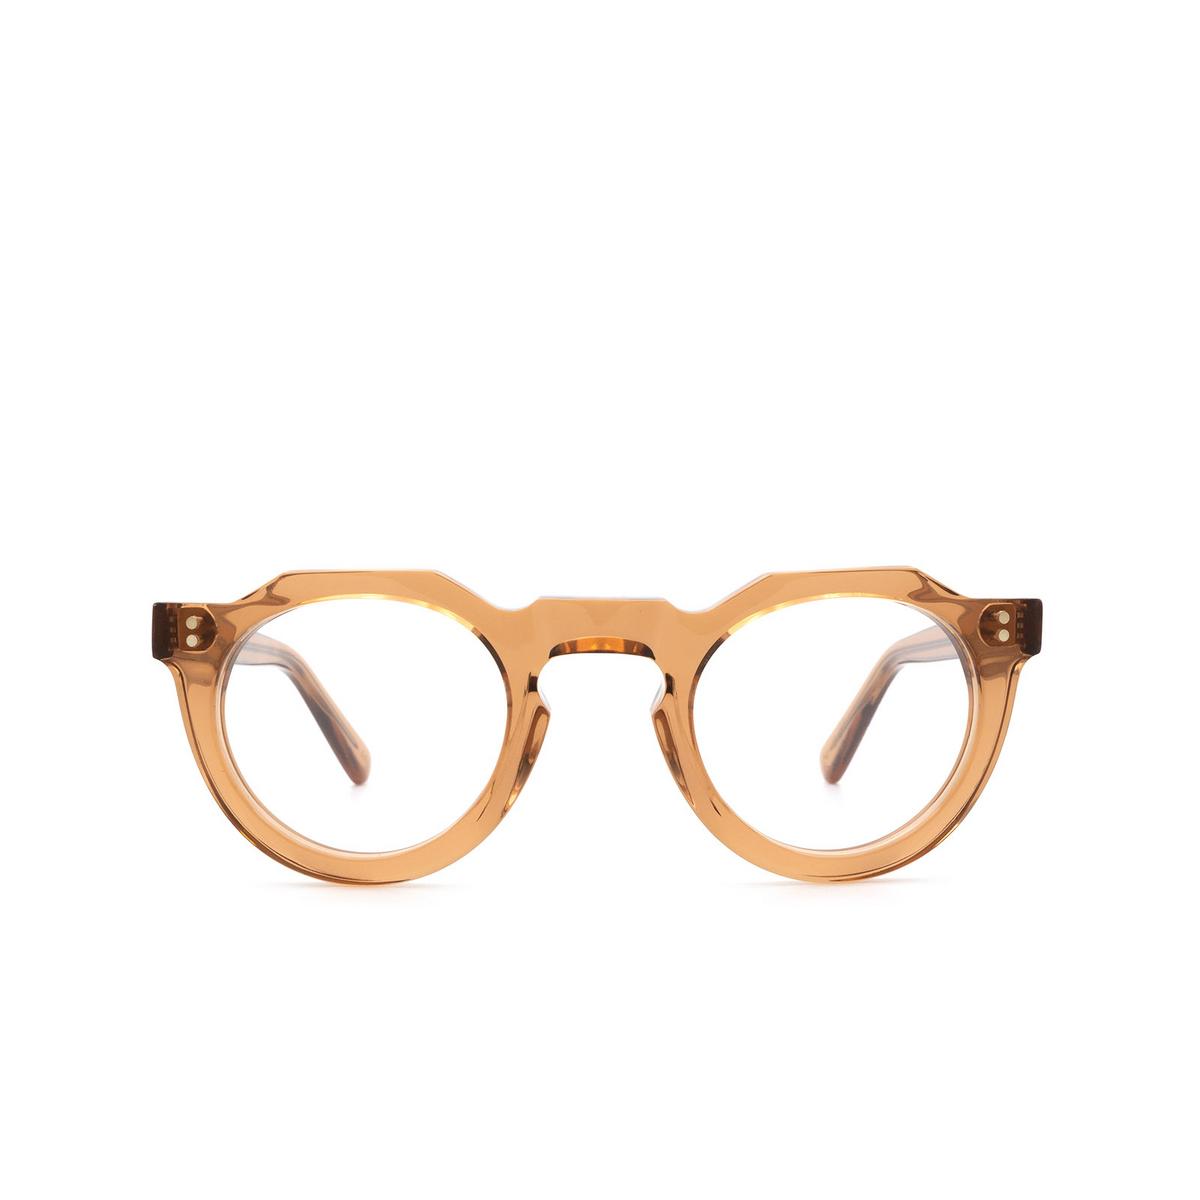 Lesca® Irregular Eyeglasses: Pica color Cognac Co - front view.